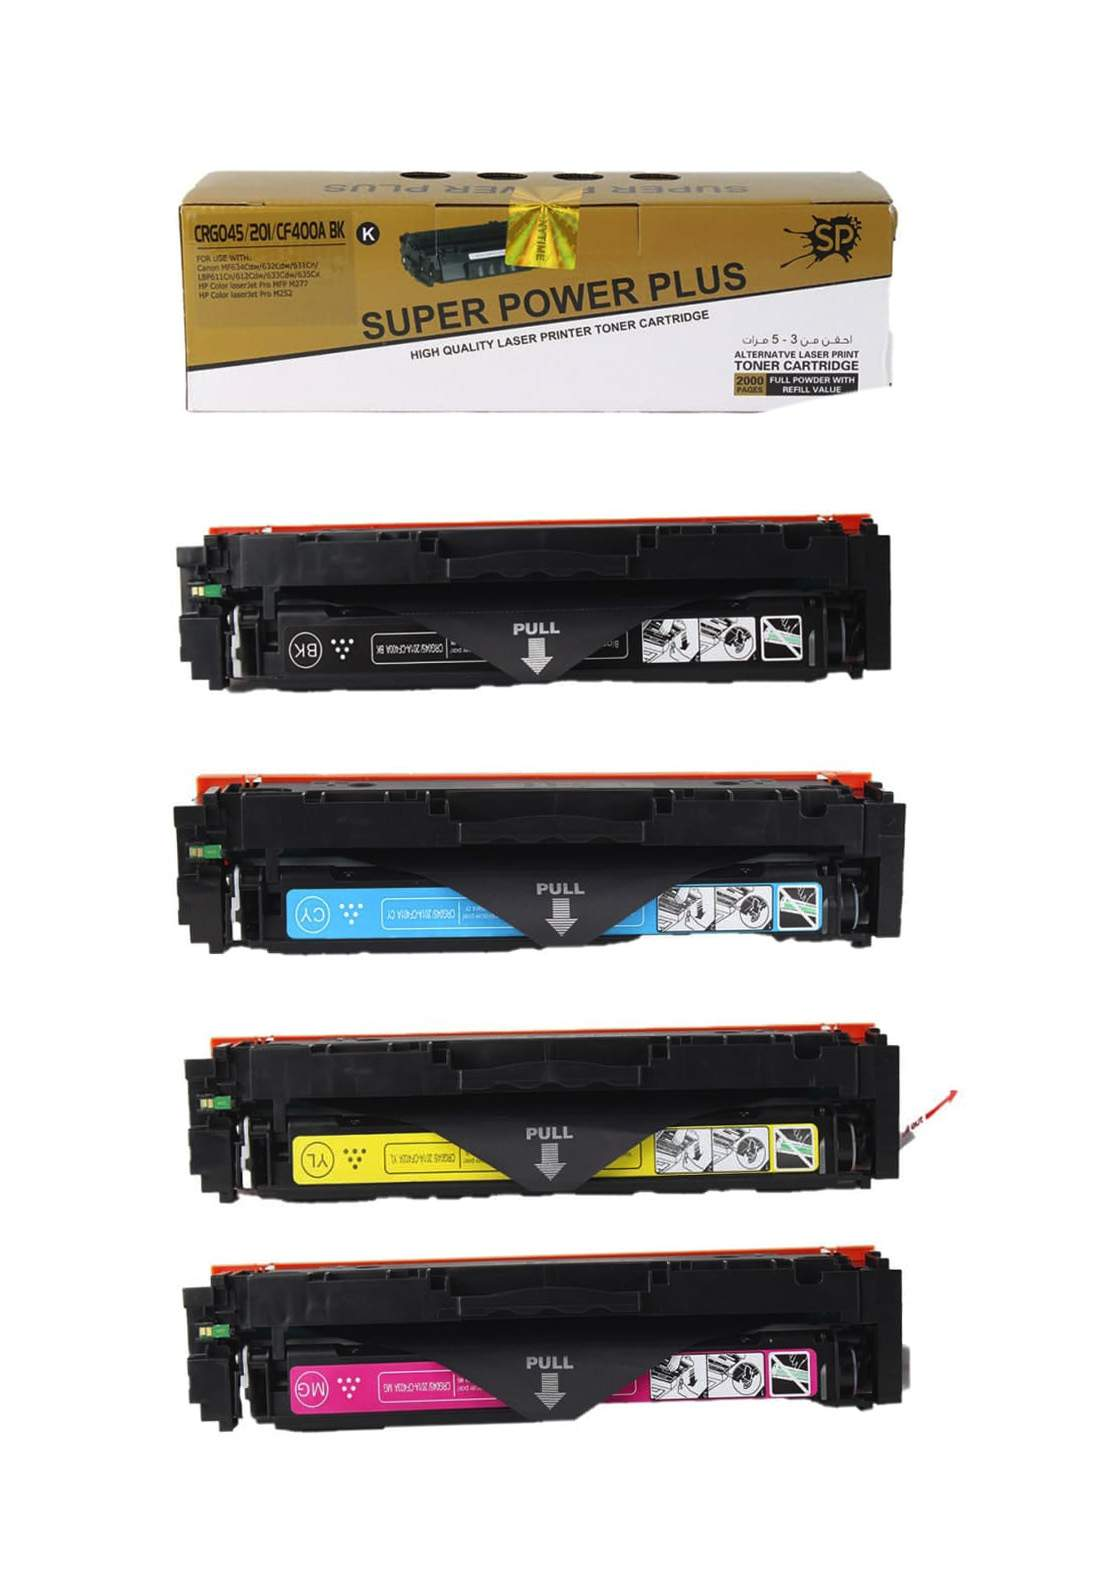 Super Power Plus 045 Laser Printer Toner Cartridge Set سيت خرطوشات حبر